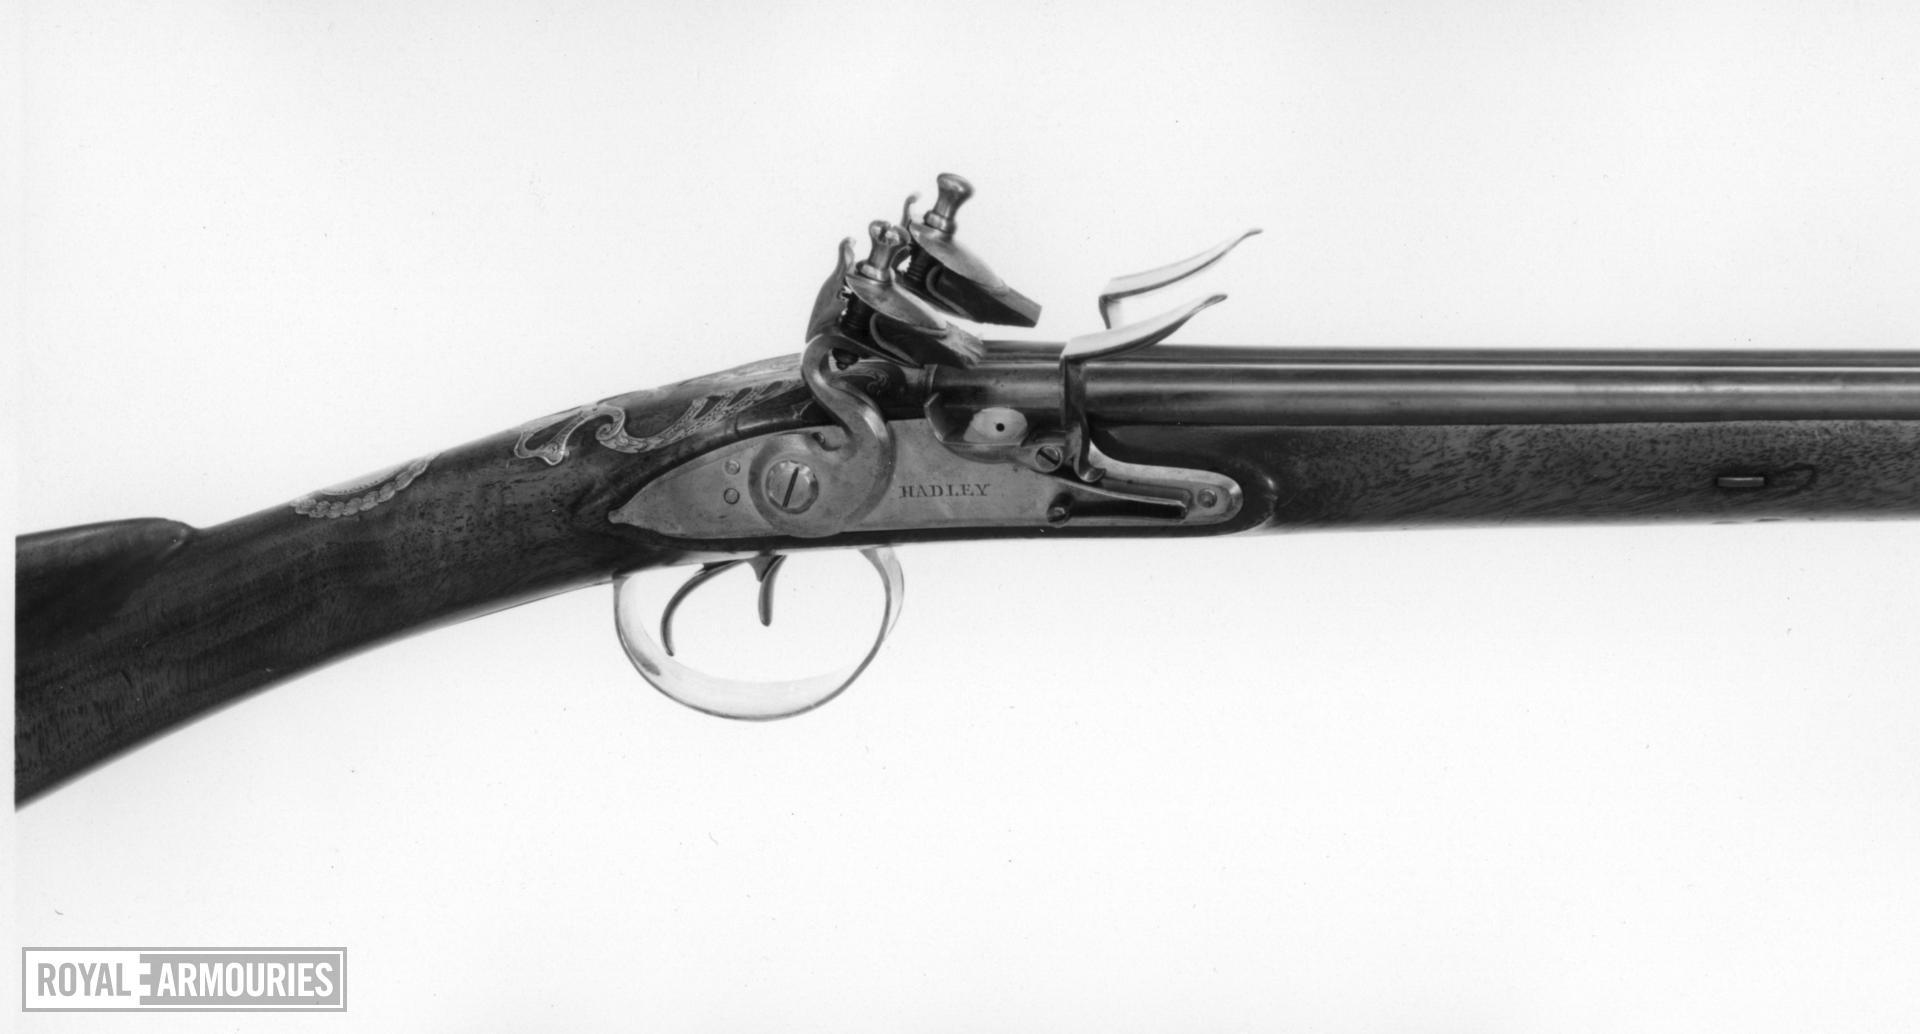 Flintlock muzzle-loading double-barrelled shotgun - By Hadley